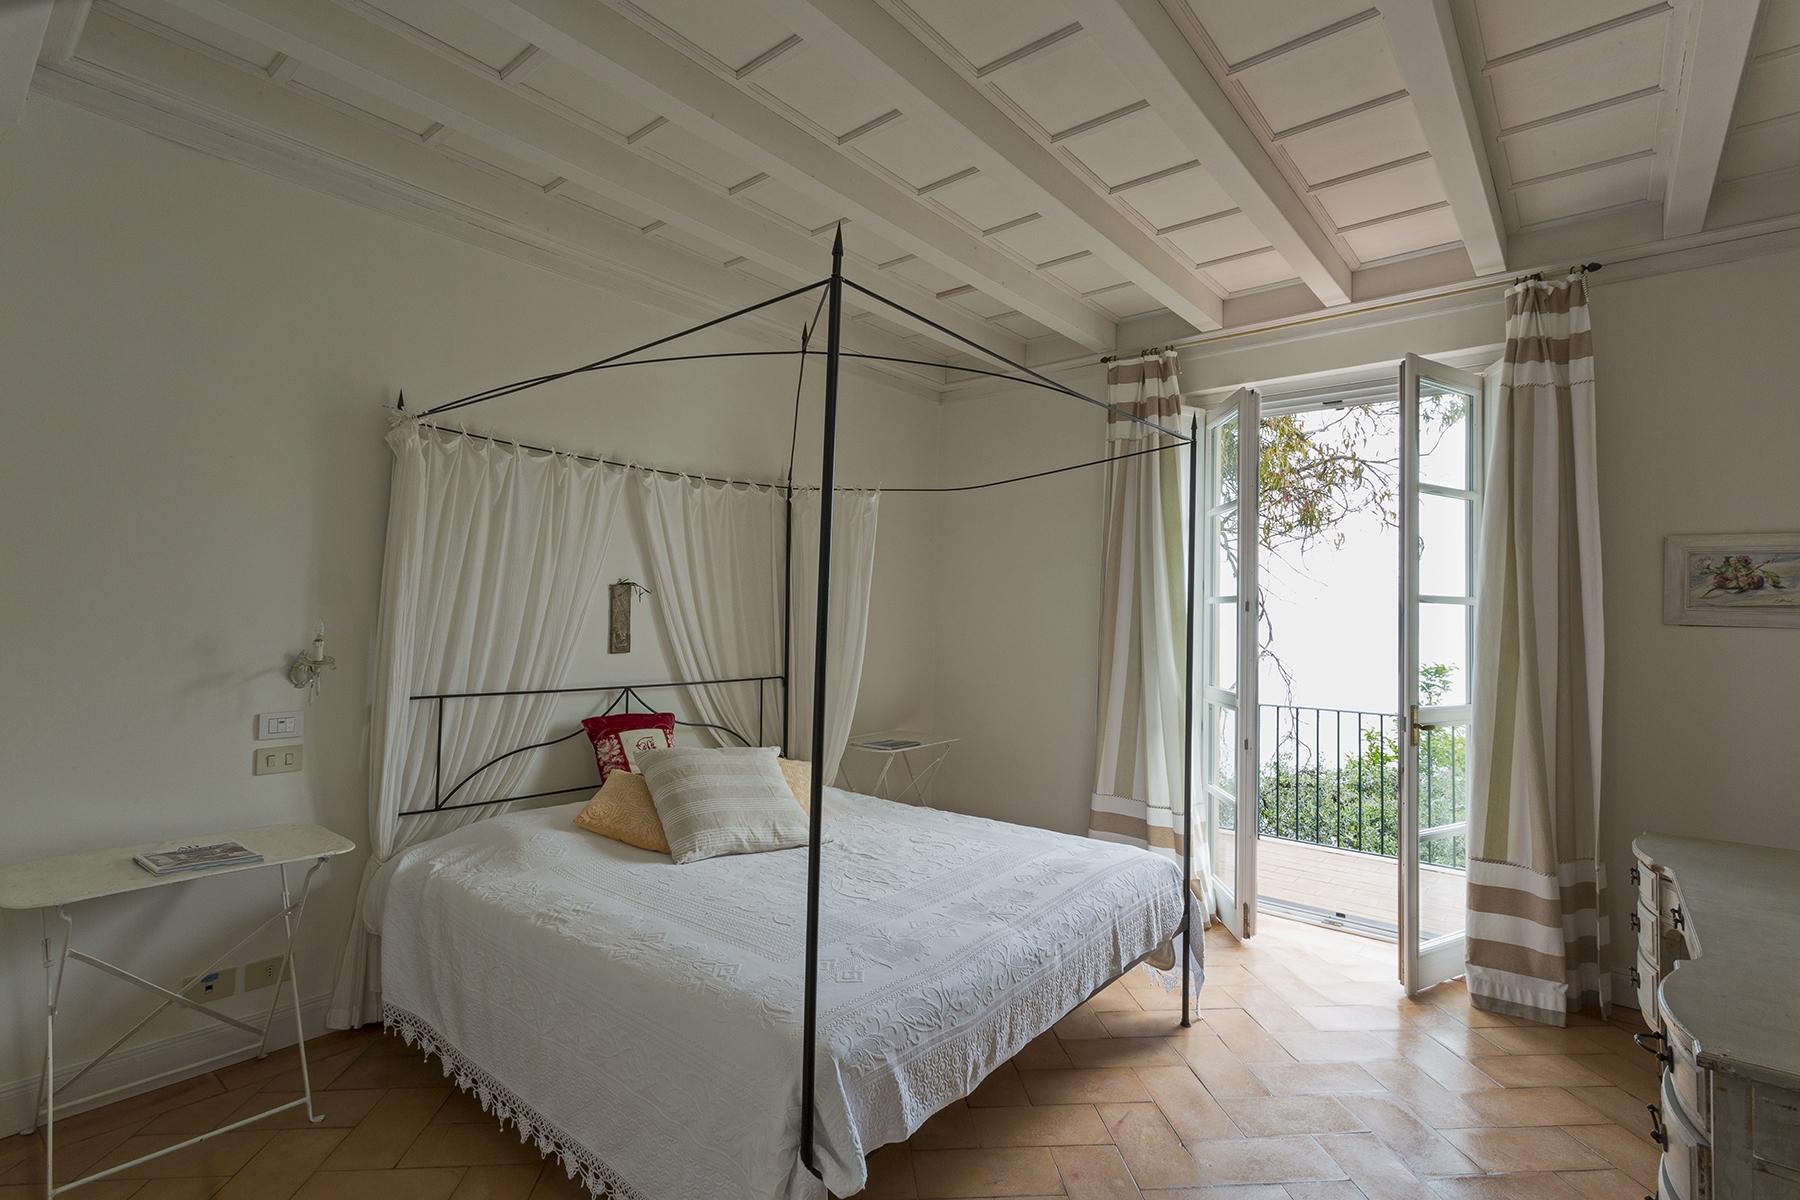 Villa in Vendita a Santa Margherita Ligure: 5 locali, 580 mq - Foto 21